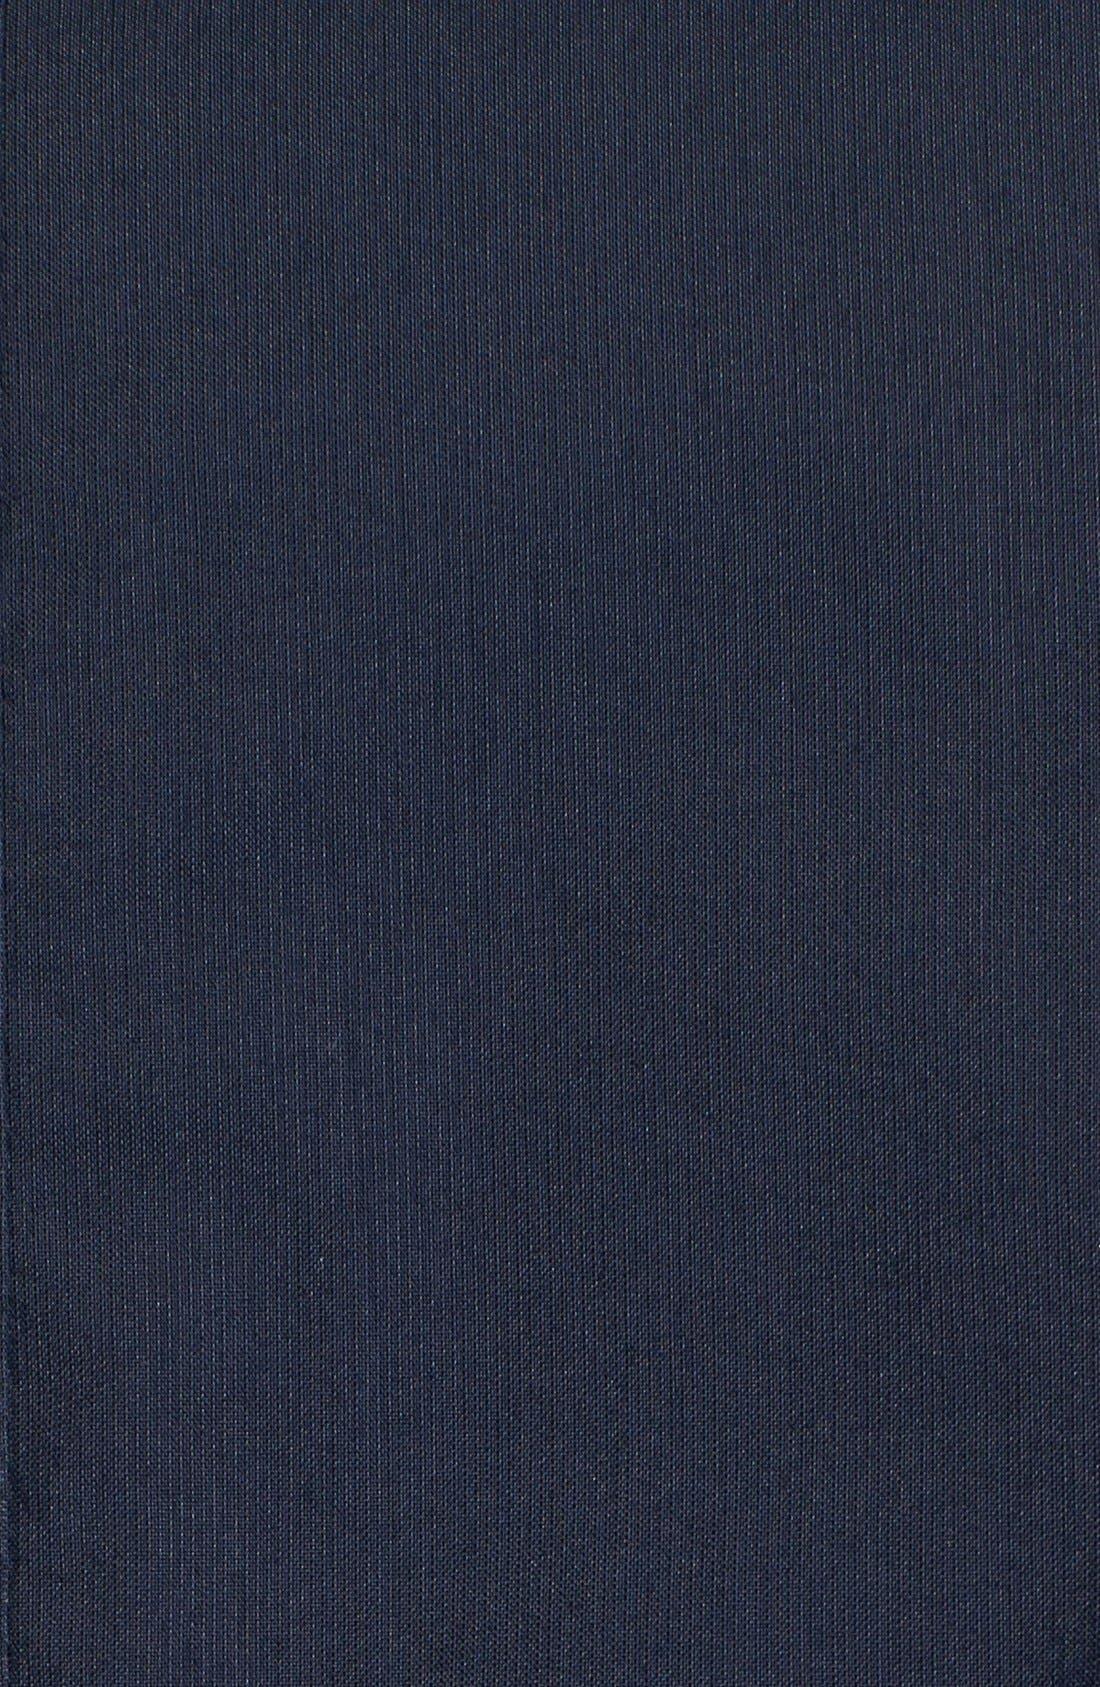 Alternate Image 3  - Façonnable Cotton Blend Jacket